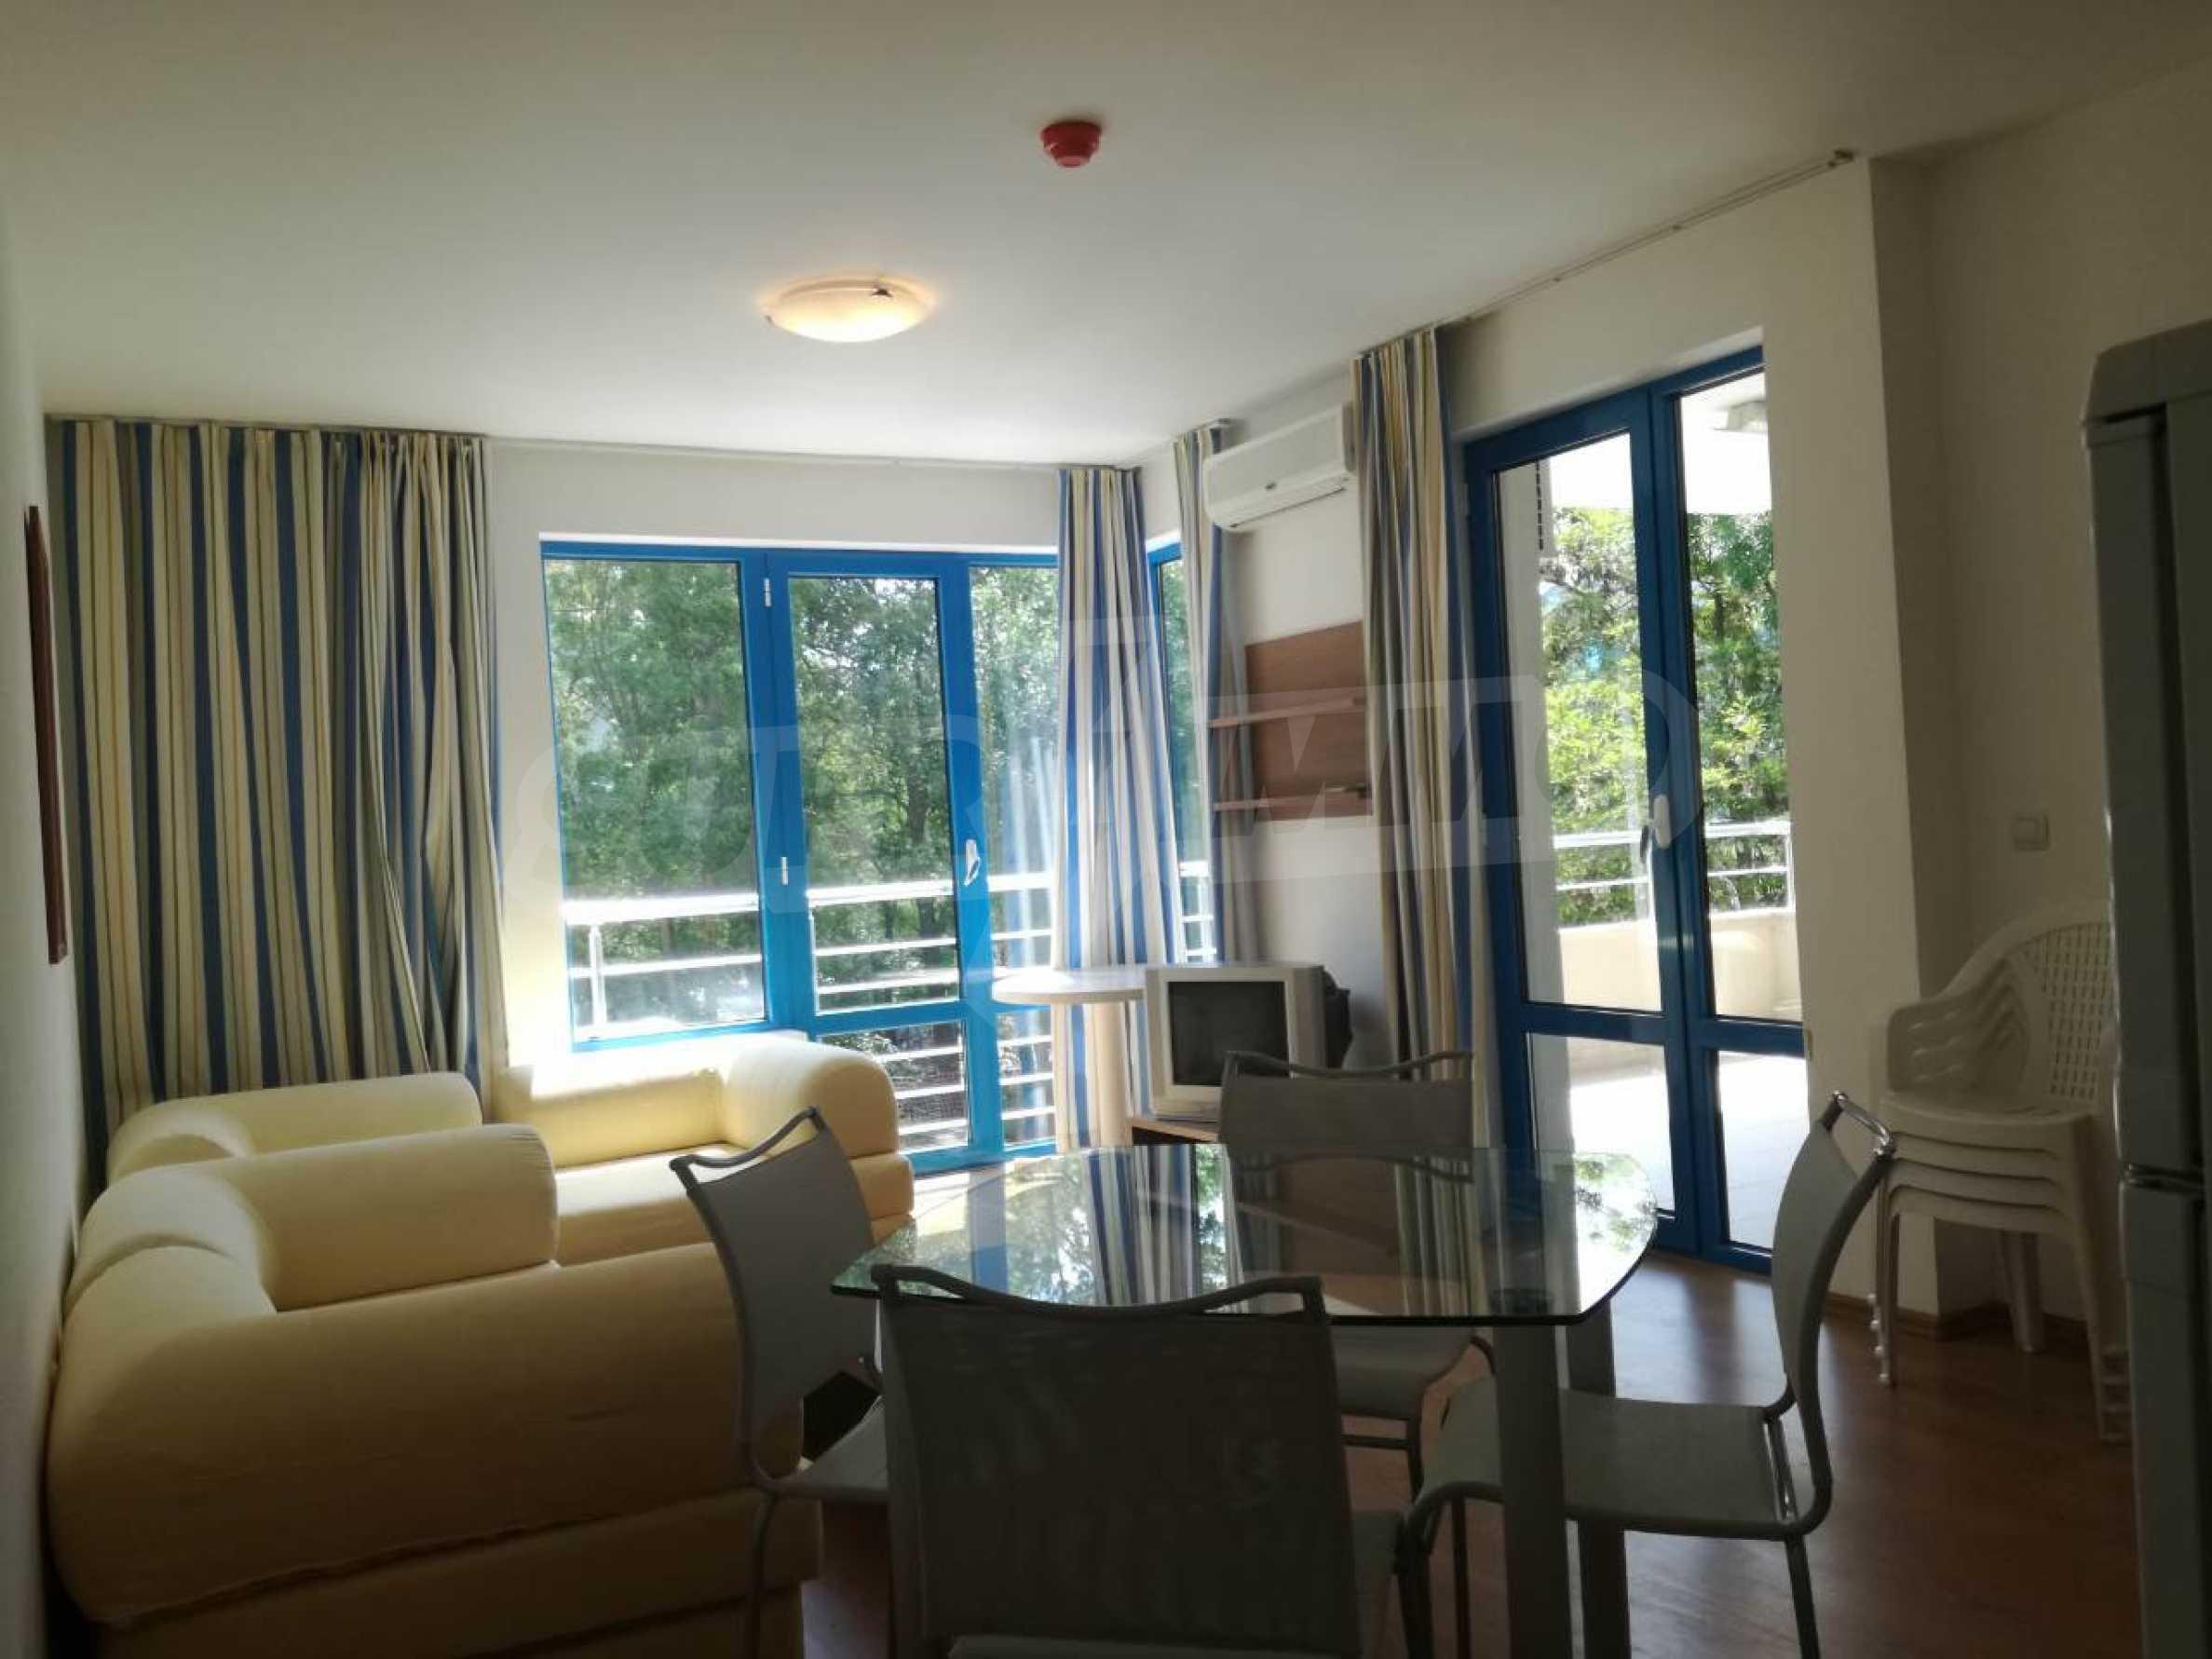 Страхотен тристаен апартамент в Слънчев бряг 9